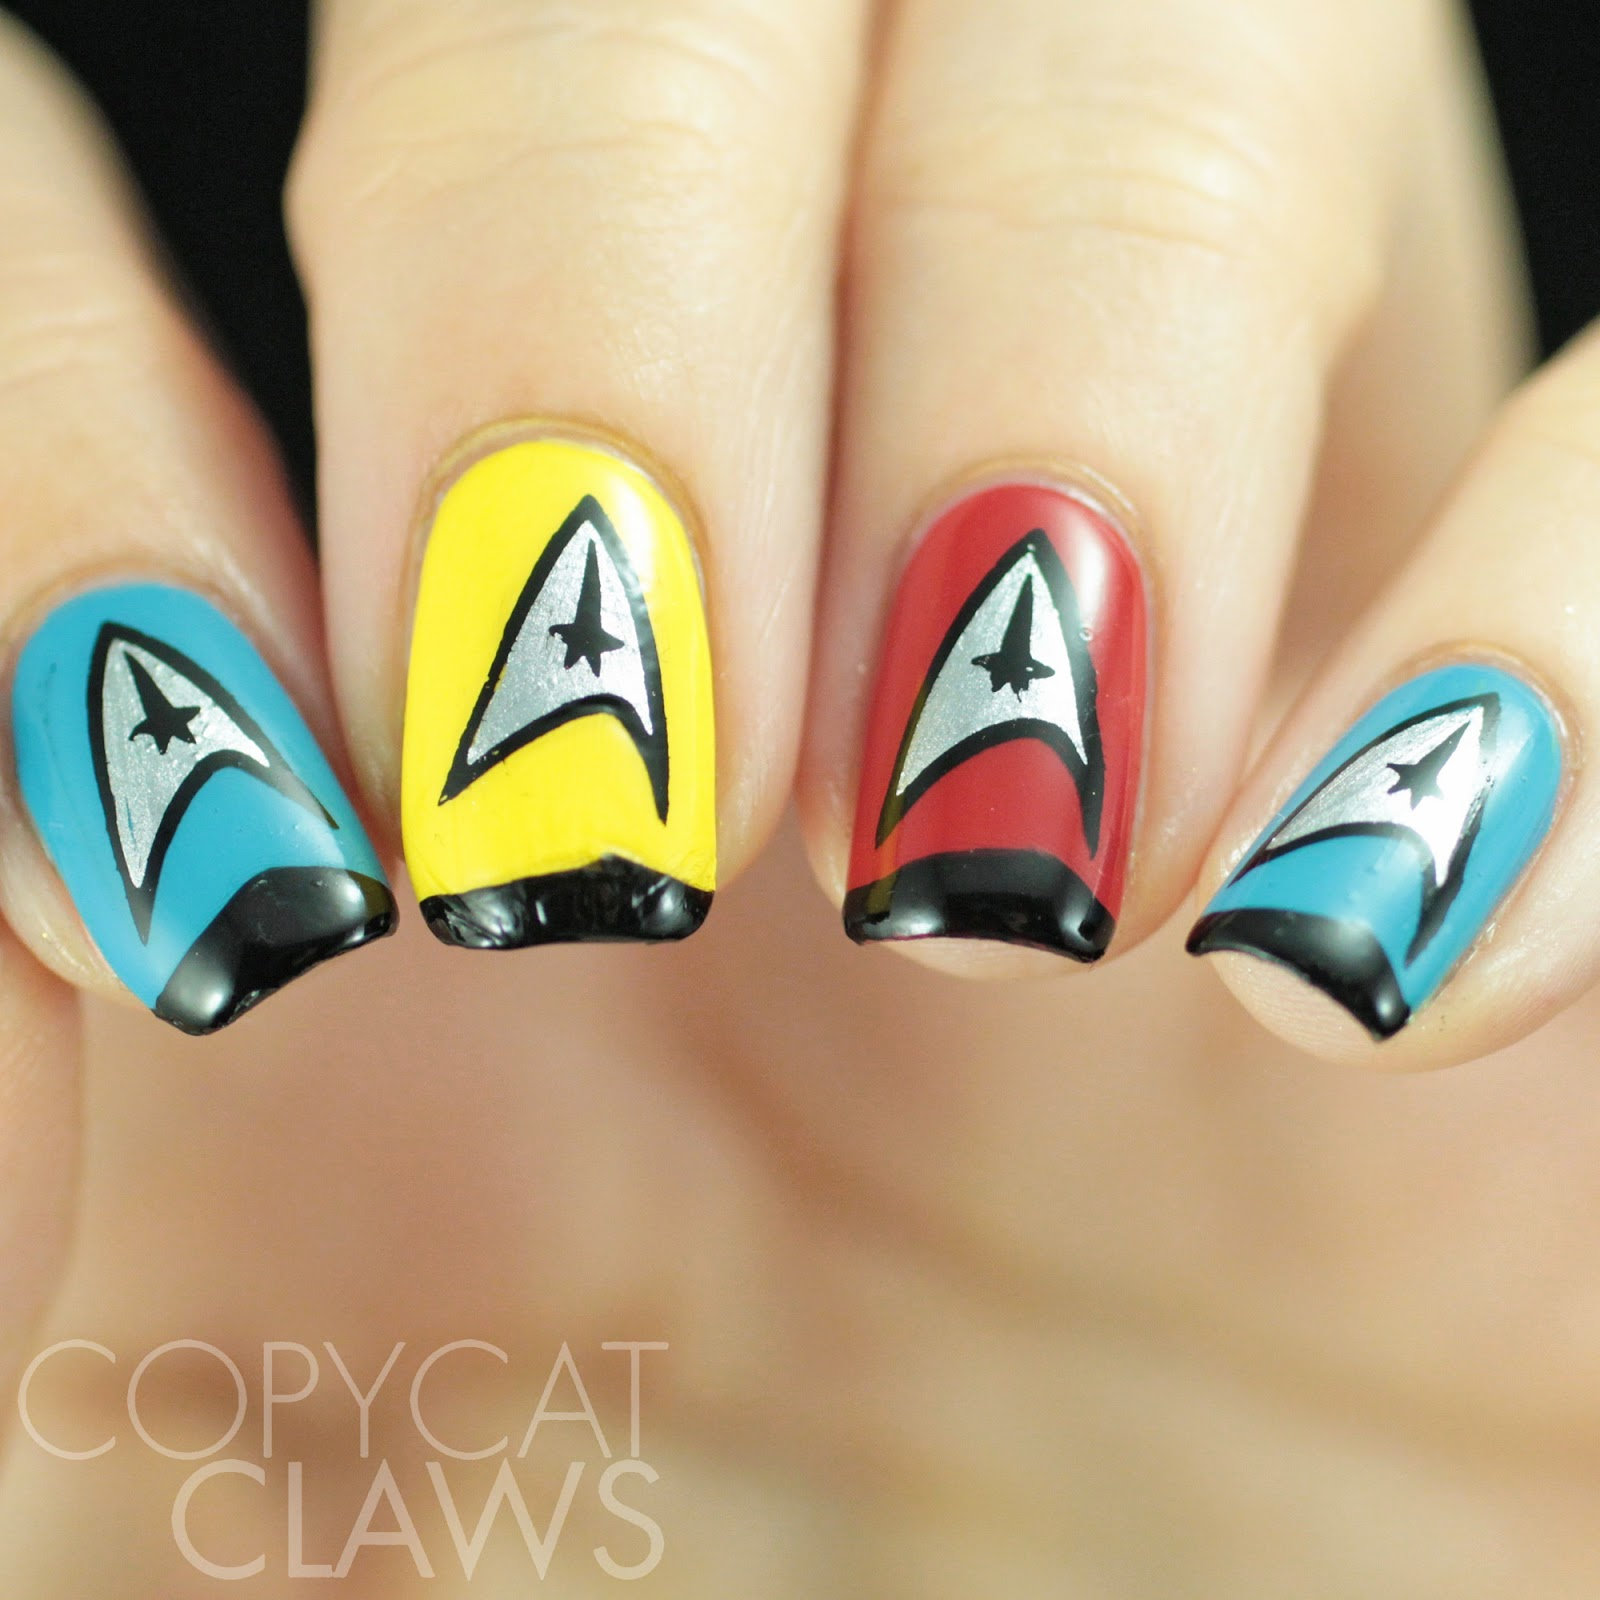 Copycat Claws: The Digit-al Dozen does Futuristic: Star Trek Nails